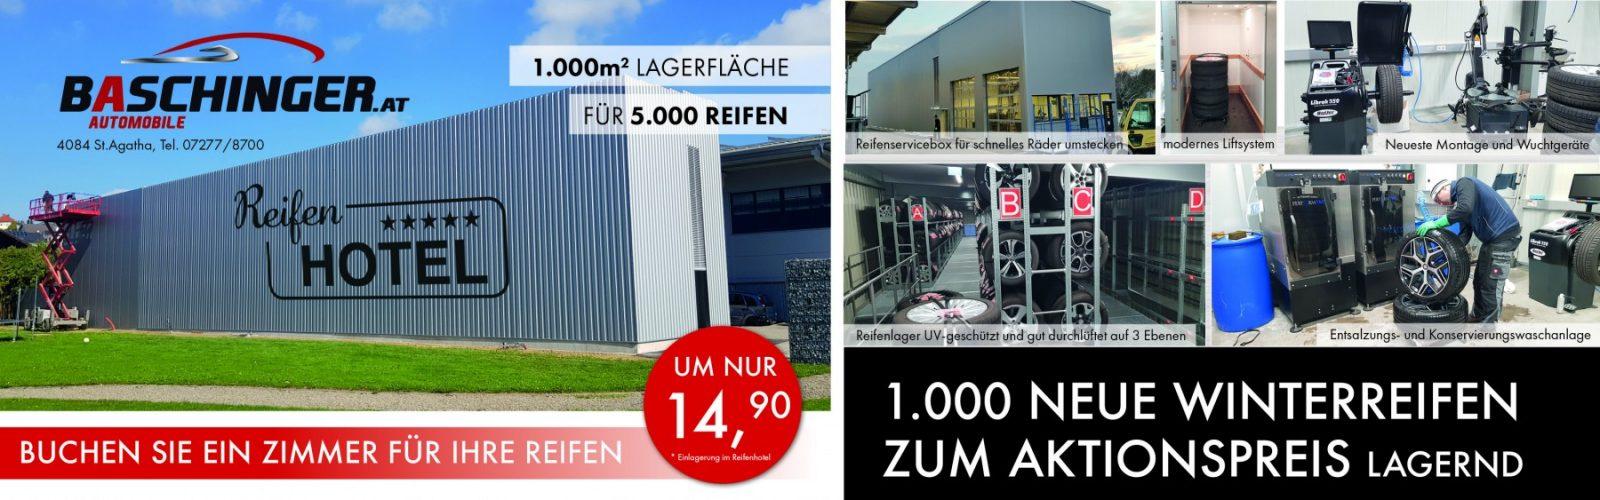 Reifenhotel Winter bei Ing. Günther Baschinger GmbH in